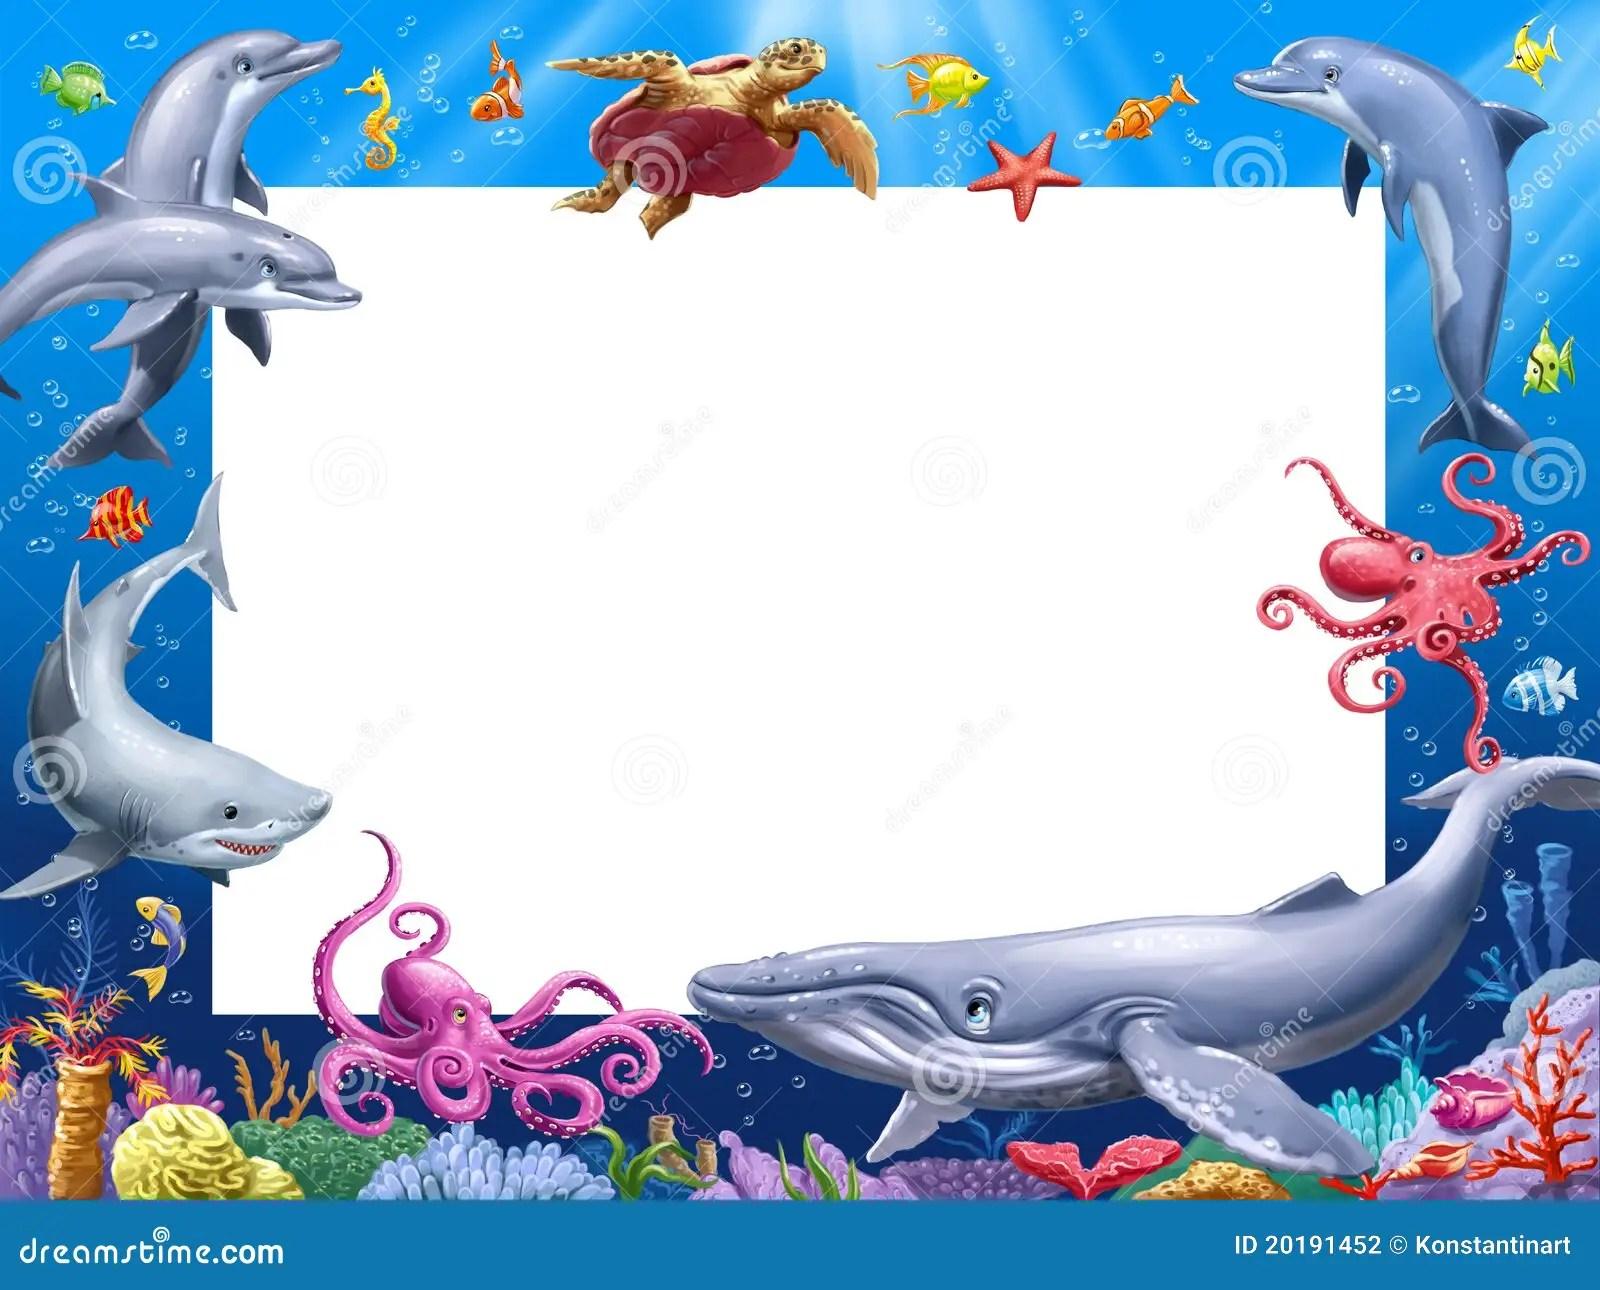 Animal Print Wallpaper Border Cartoon Frame Stock Illustration Image Of Cartoon Frame